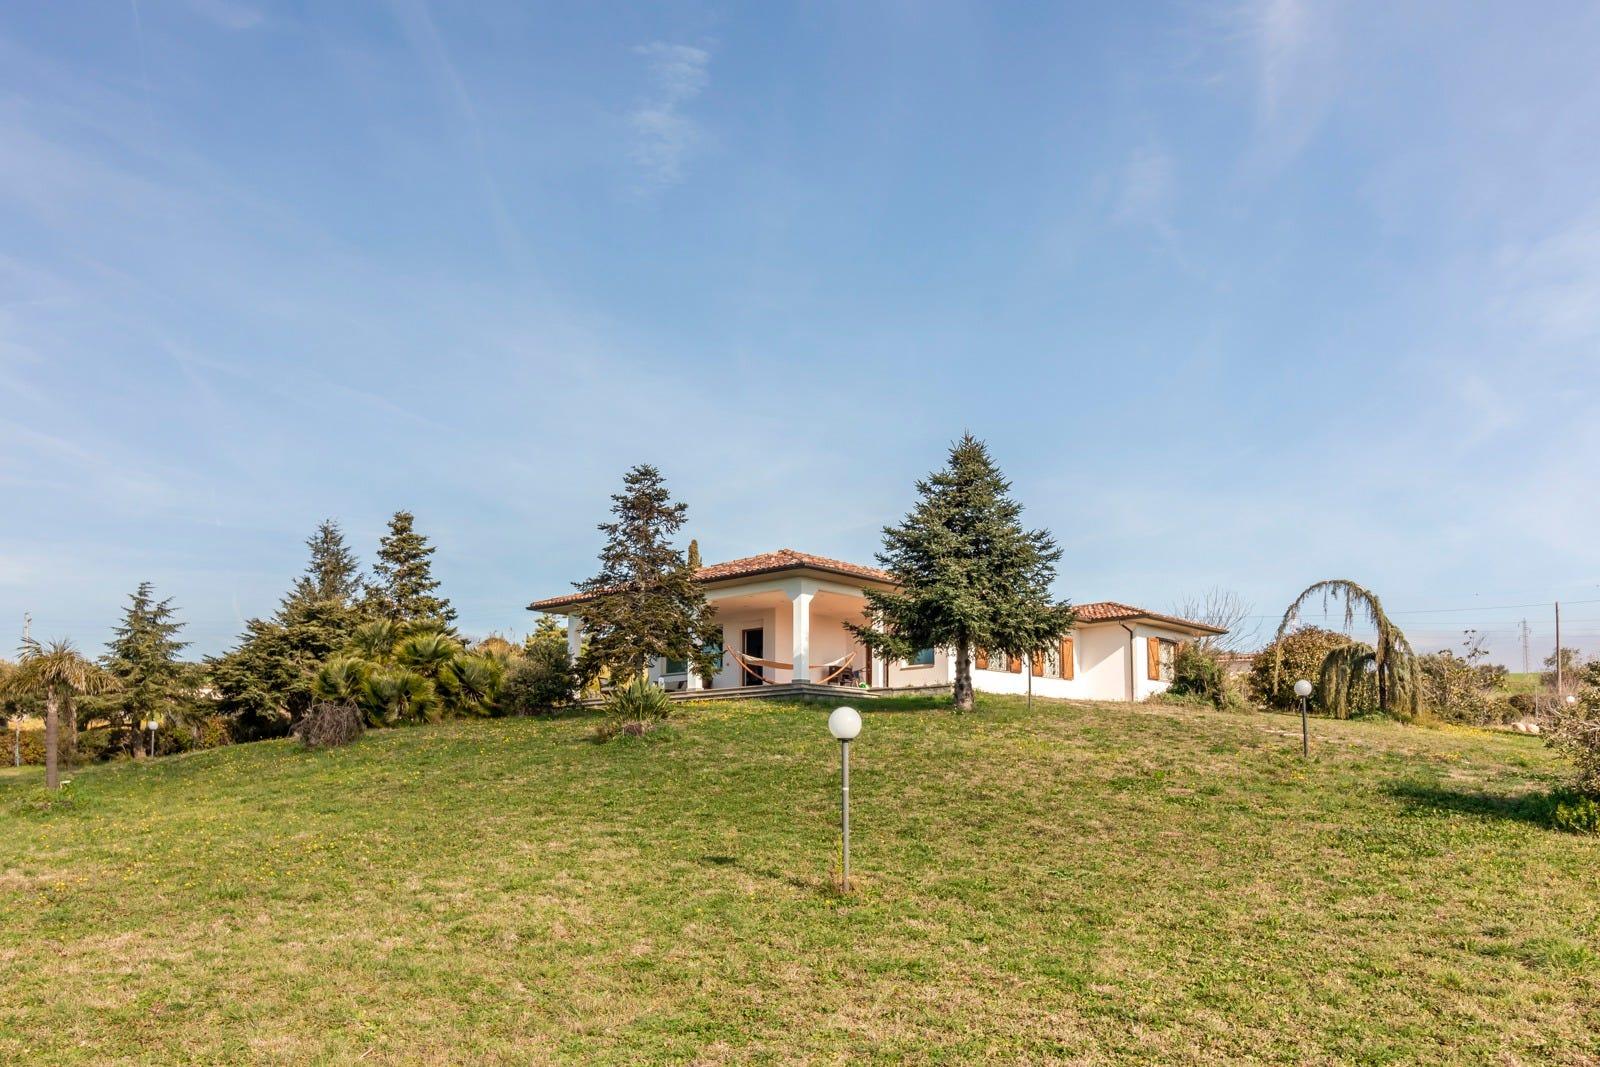 Villa_Tarquinia (16)